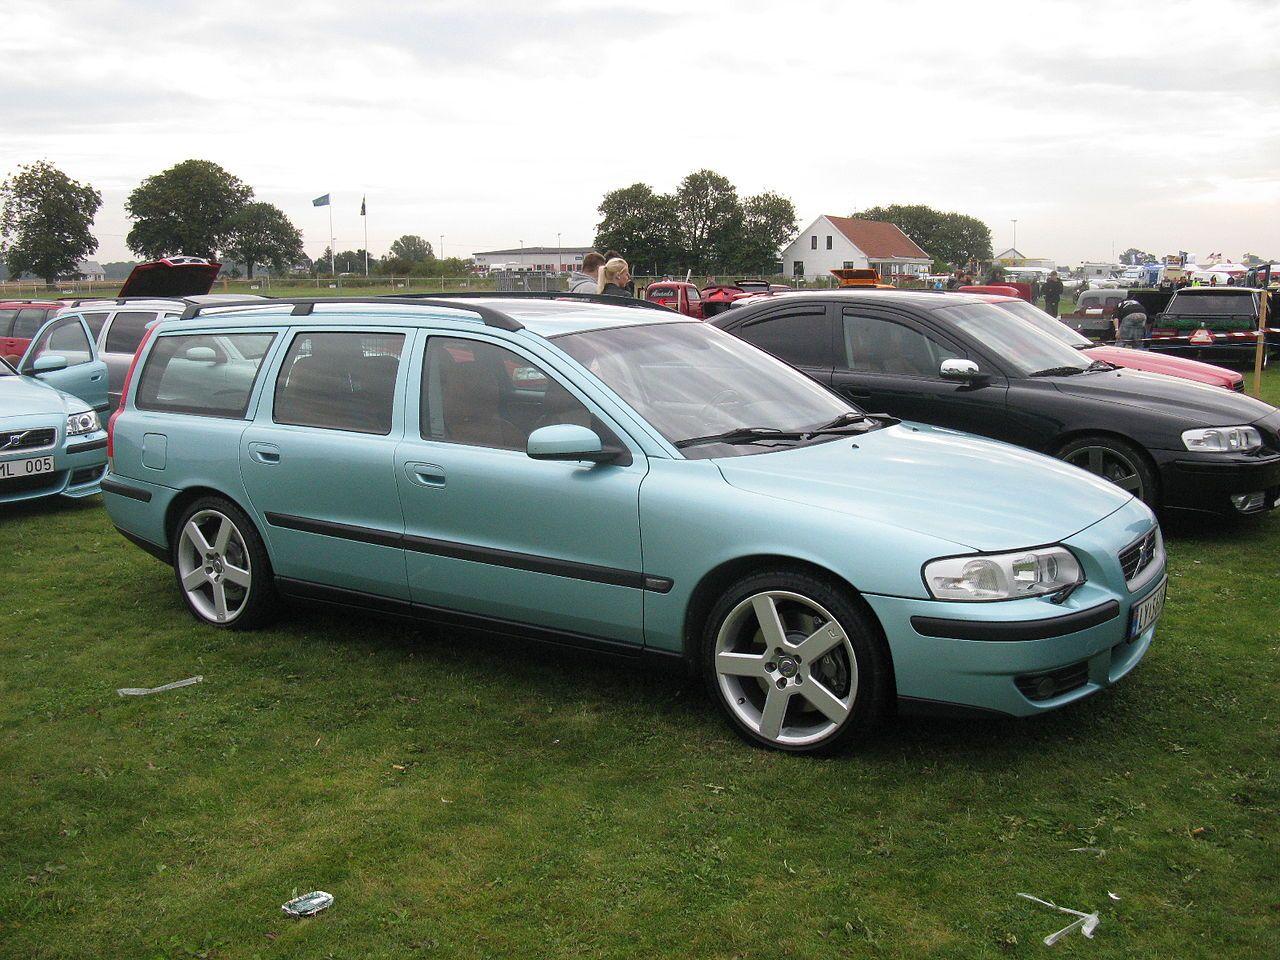 Volvo V70 R (9618322974) - Volvo V70 - Wikipedia, the free